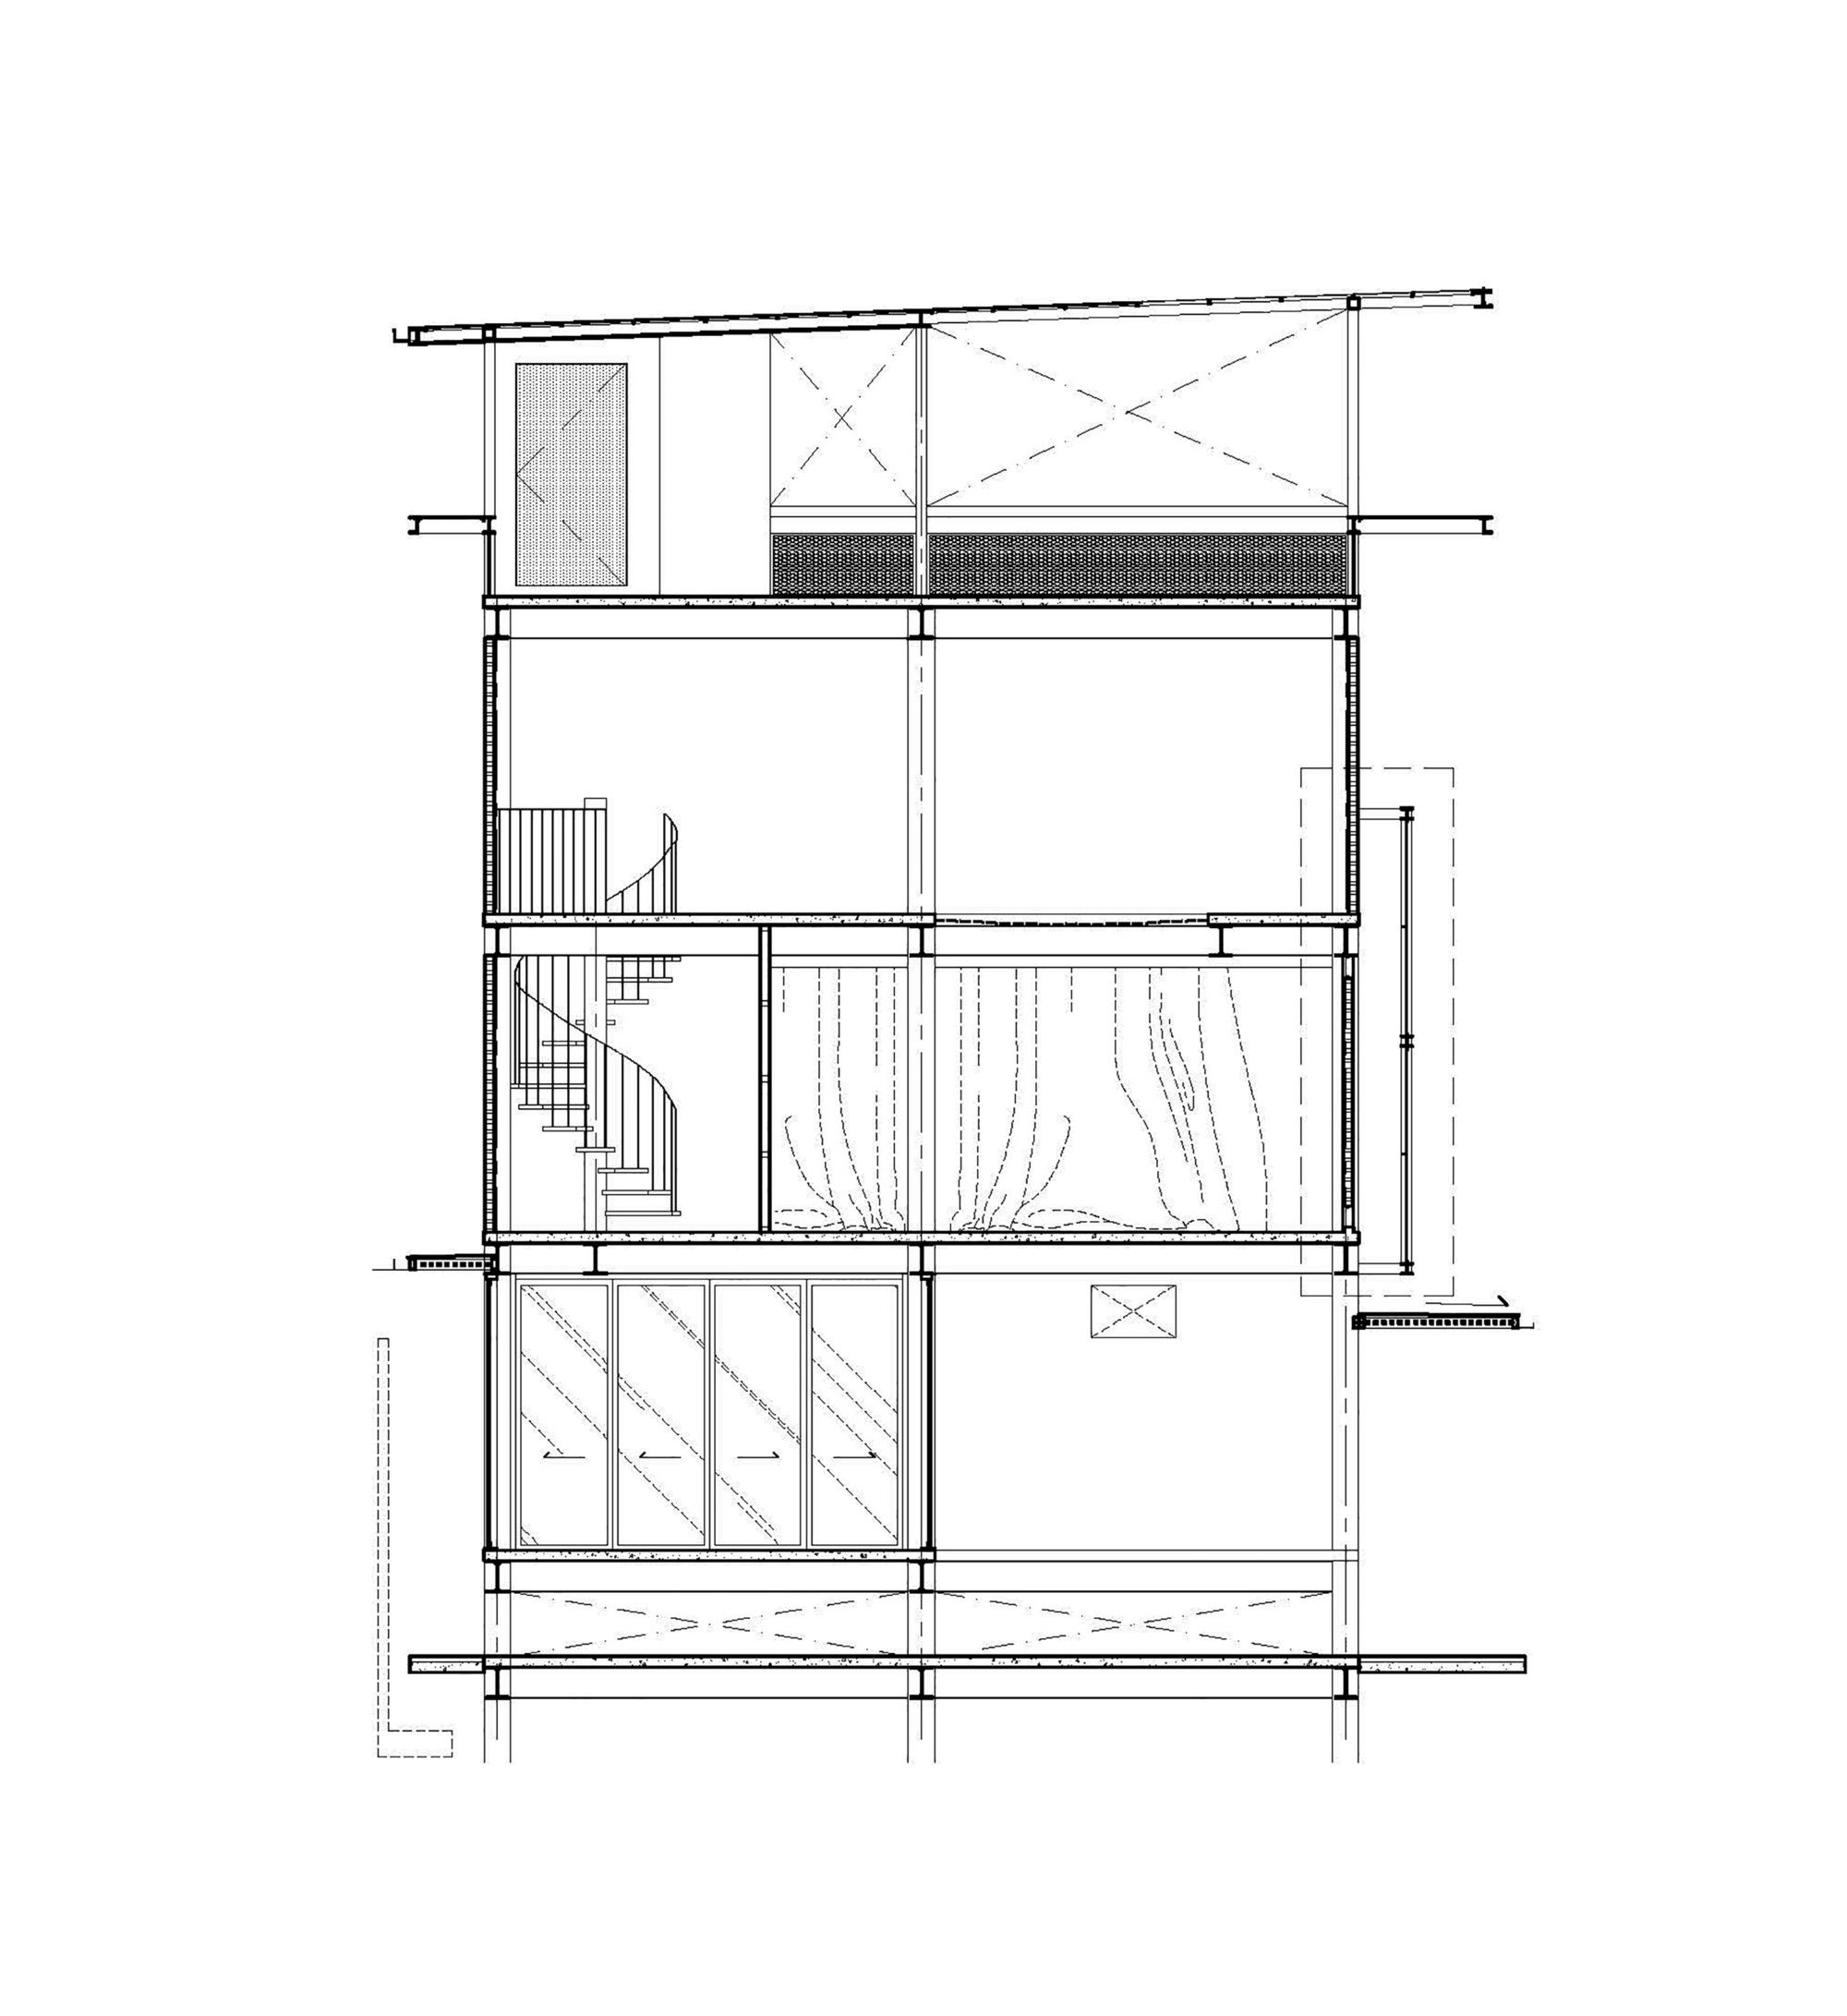 Bridge House By Junsekino Architect And Design: Gallery Of Tinman House / Junsekino Architect And Design